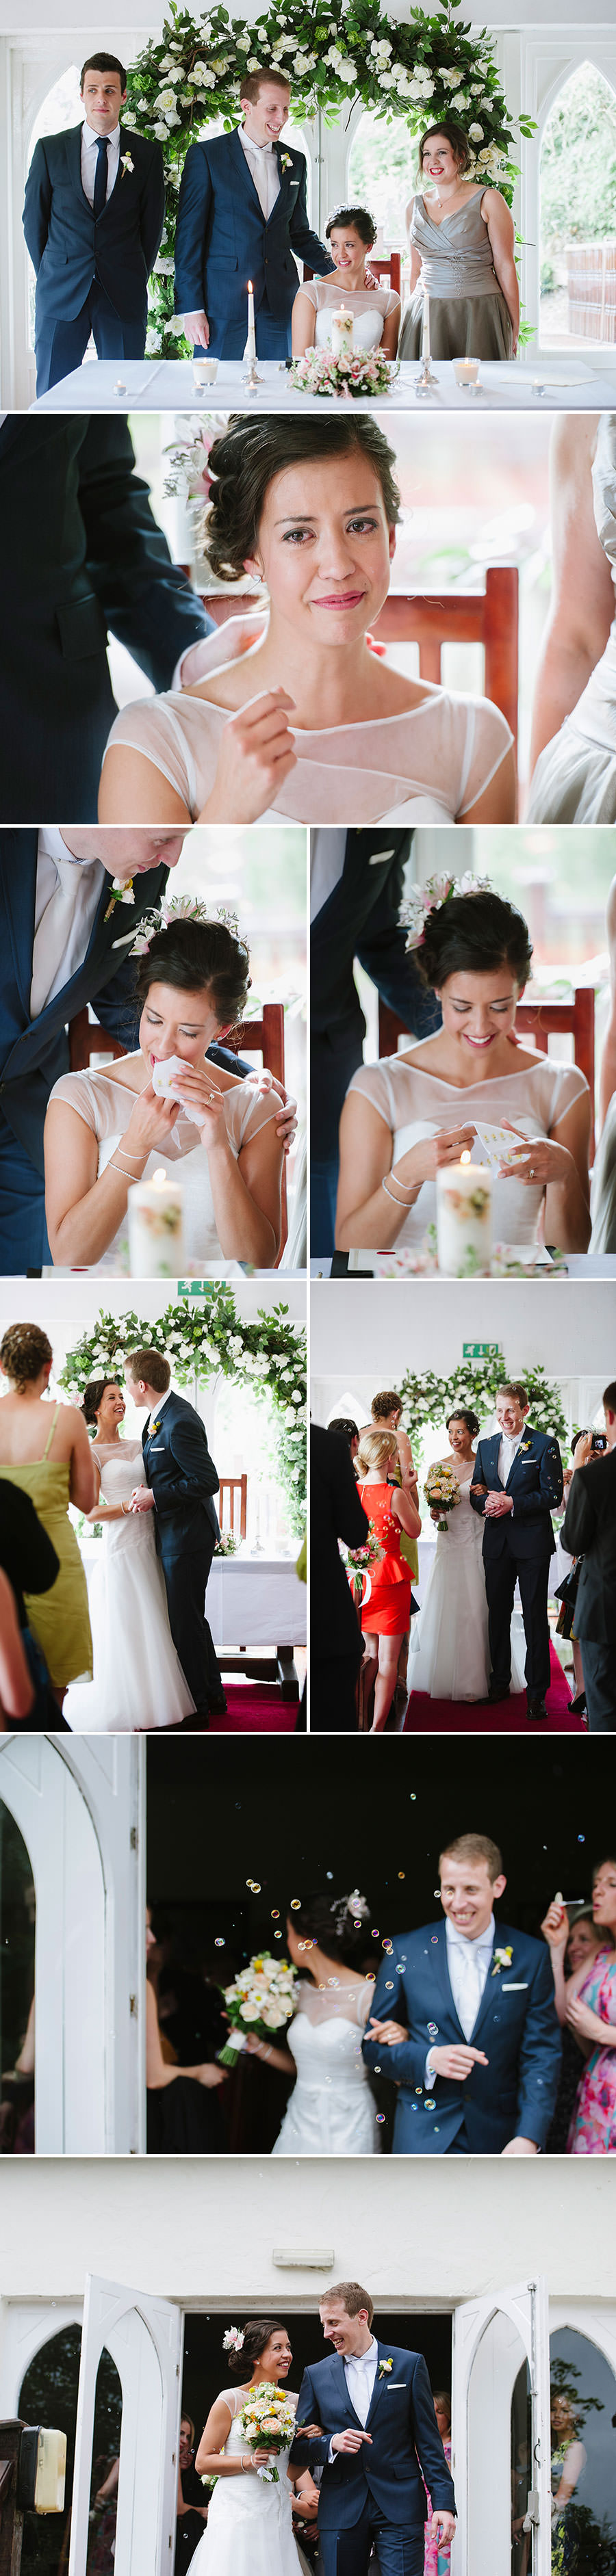 P + R | Barnabrow Country House Wedding | Irish - Australian Wedding | Cork Wedding Photography 9